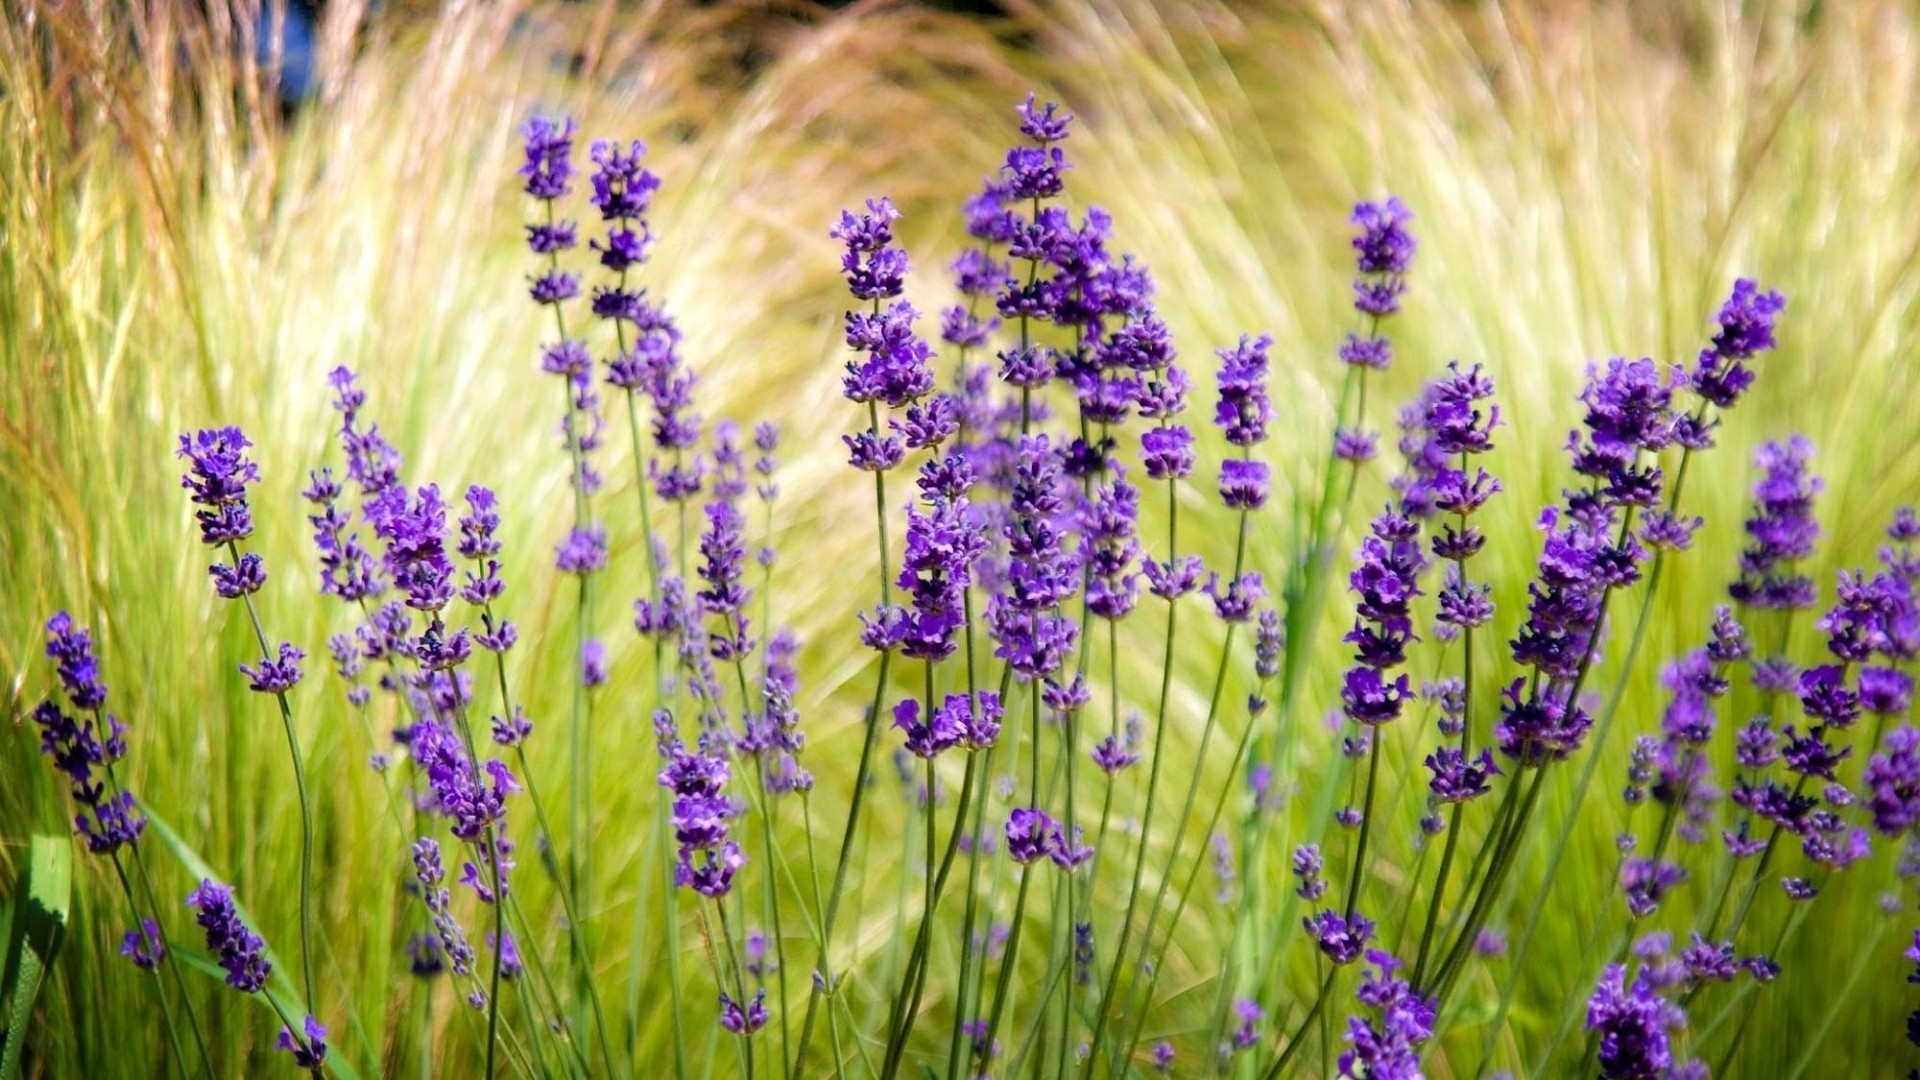 Lavender Full HD Wallpaper